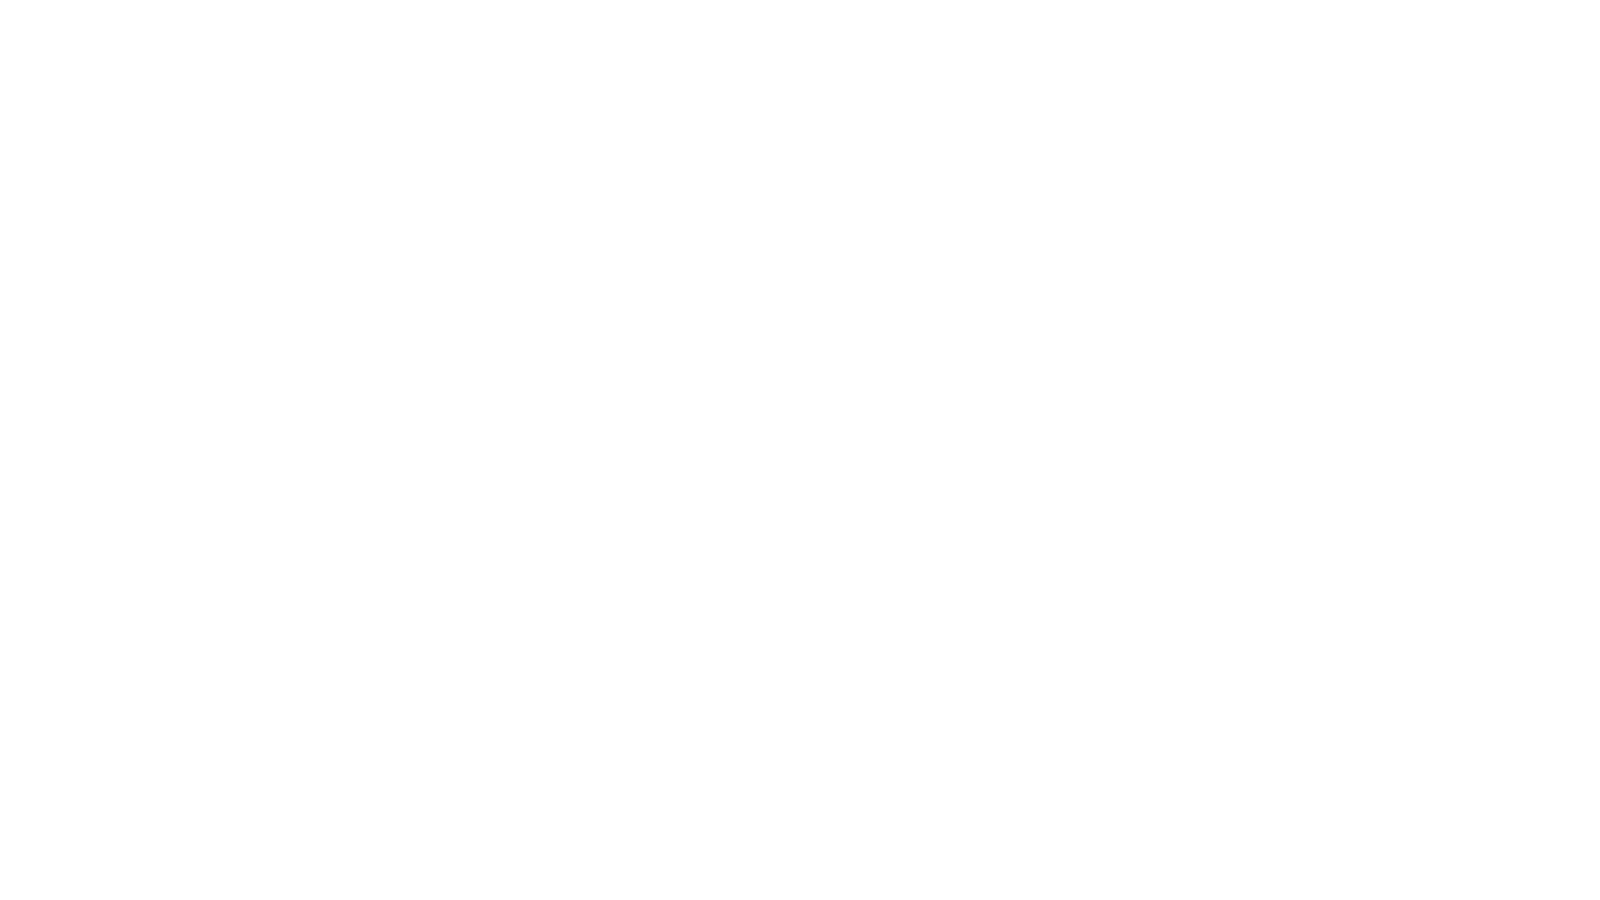 www.startnext.com/undichmagdich